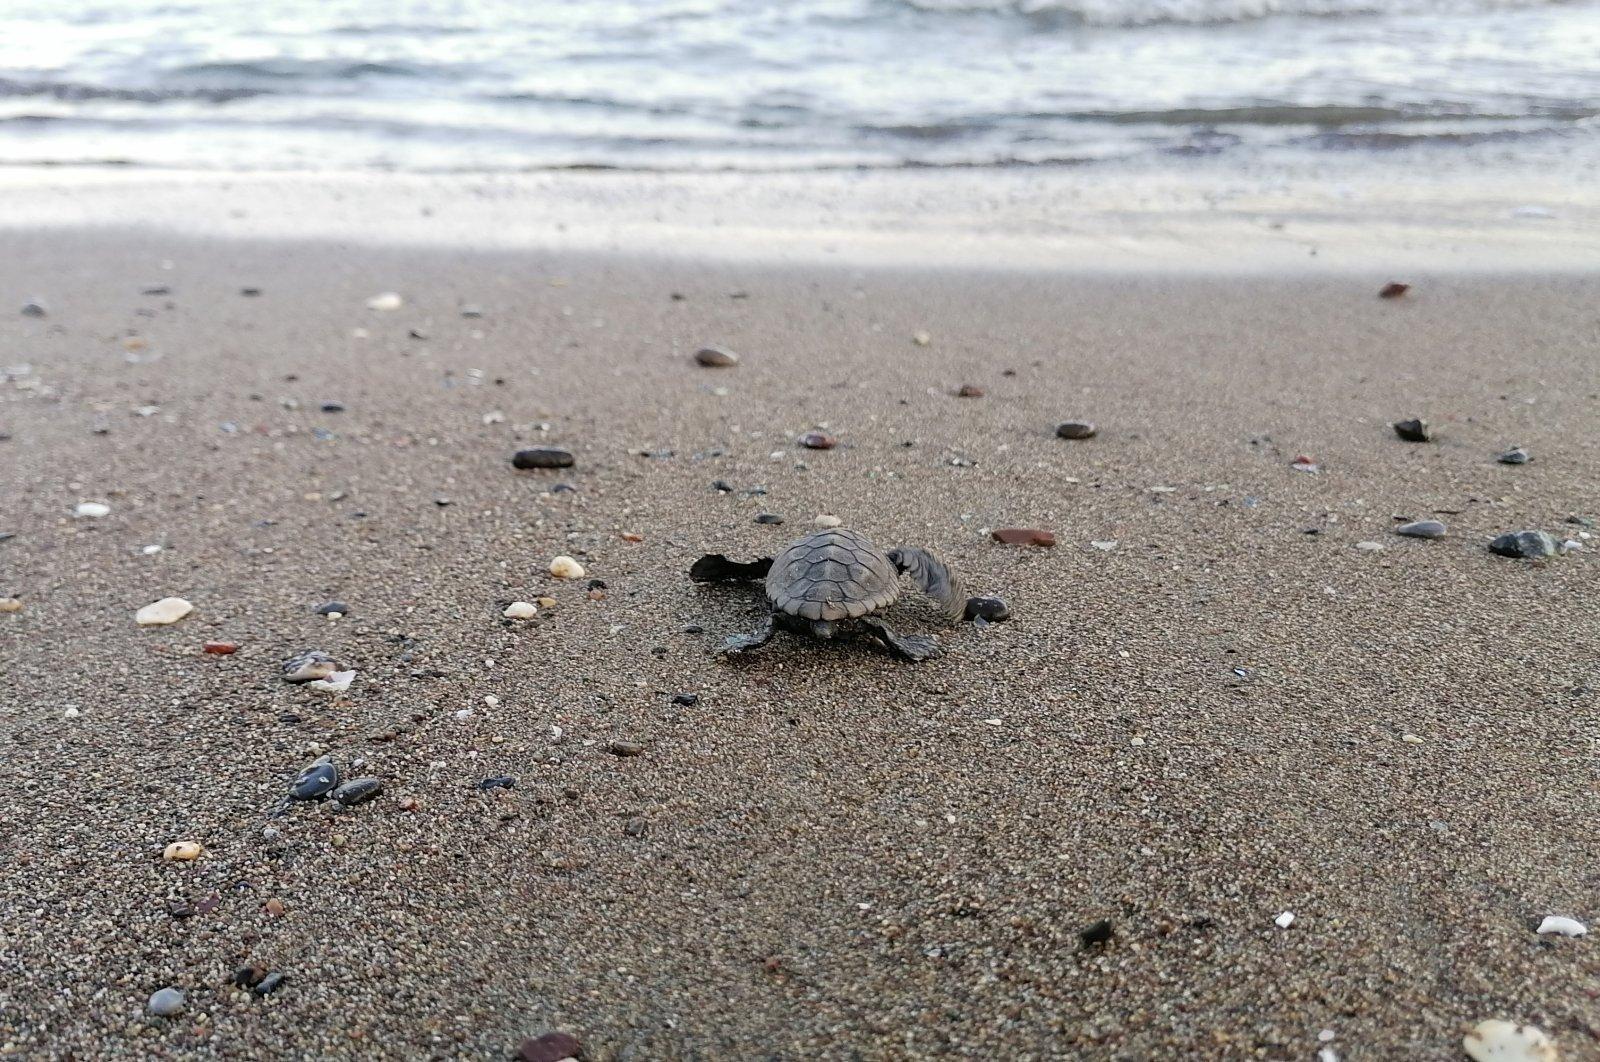 Thousands of baby turtles reach sea from undisturbed beaches in Turkey